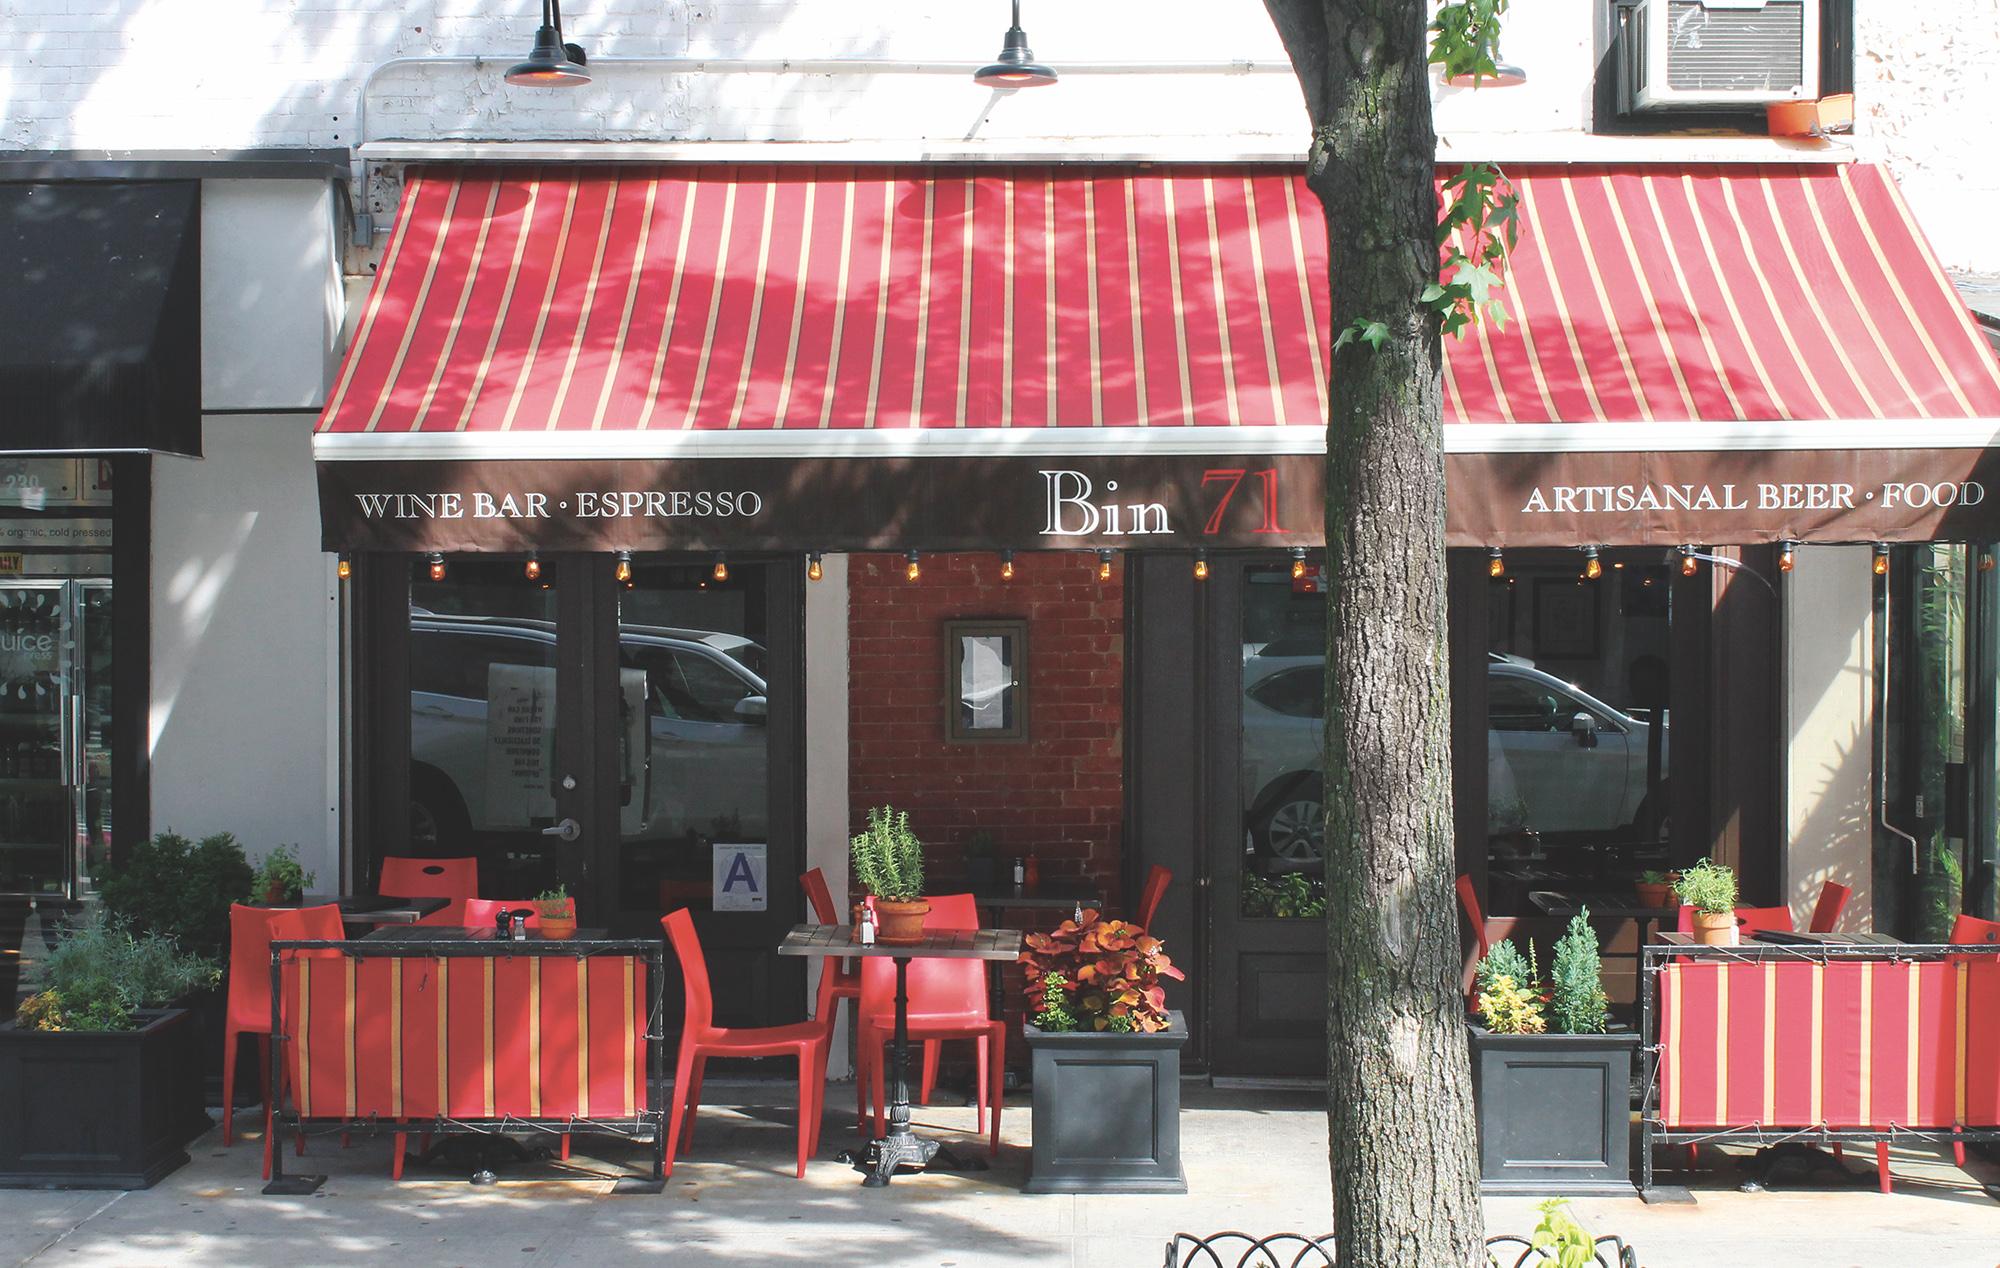 Condos near Bin 71 Restaurant